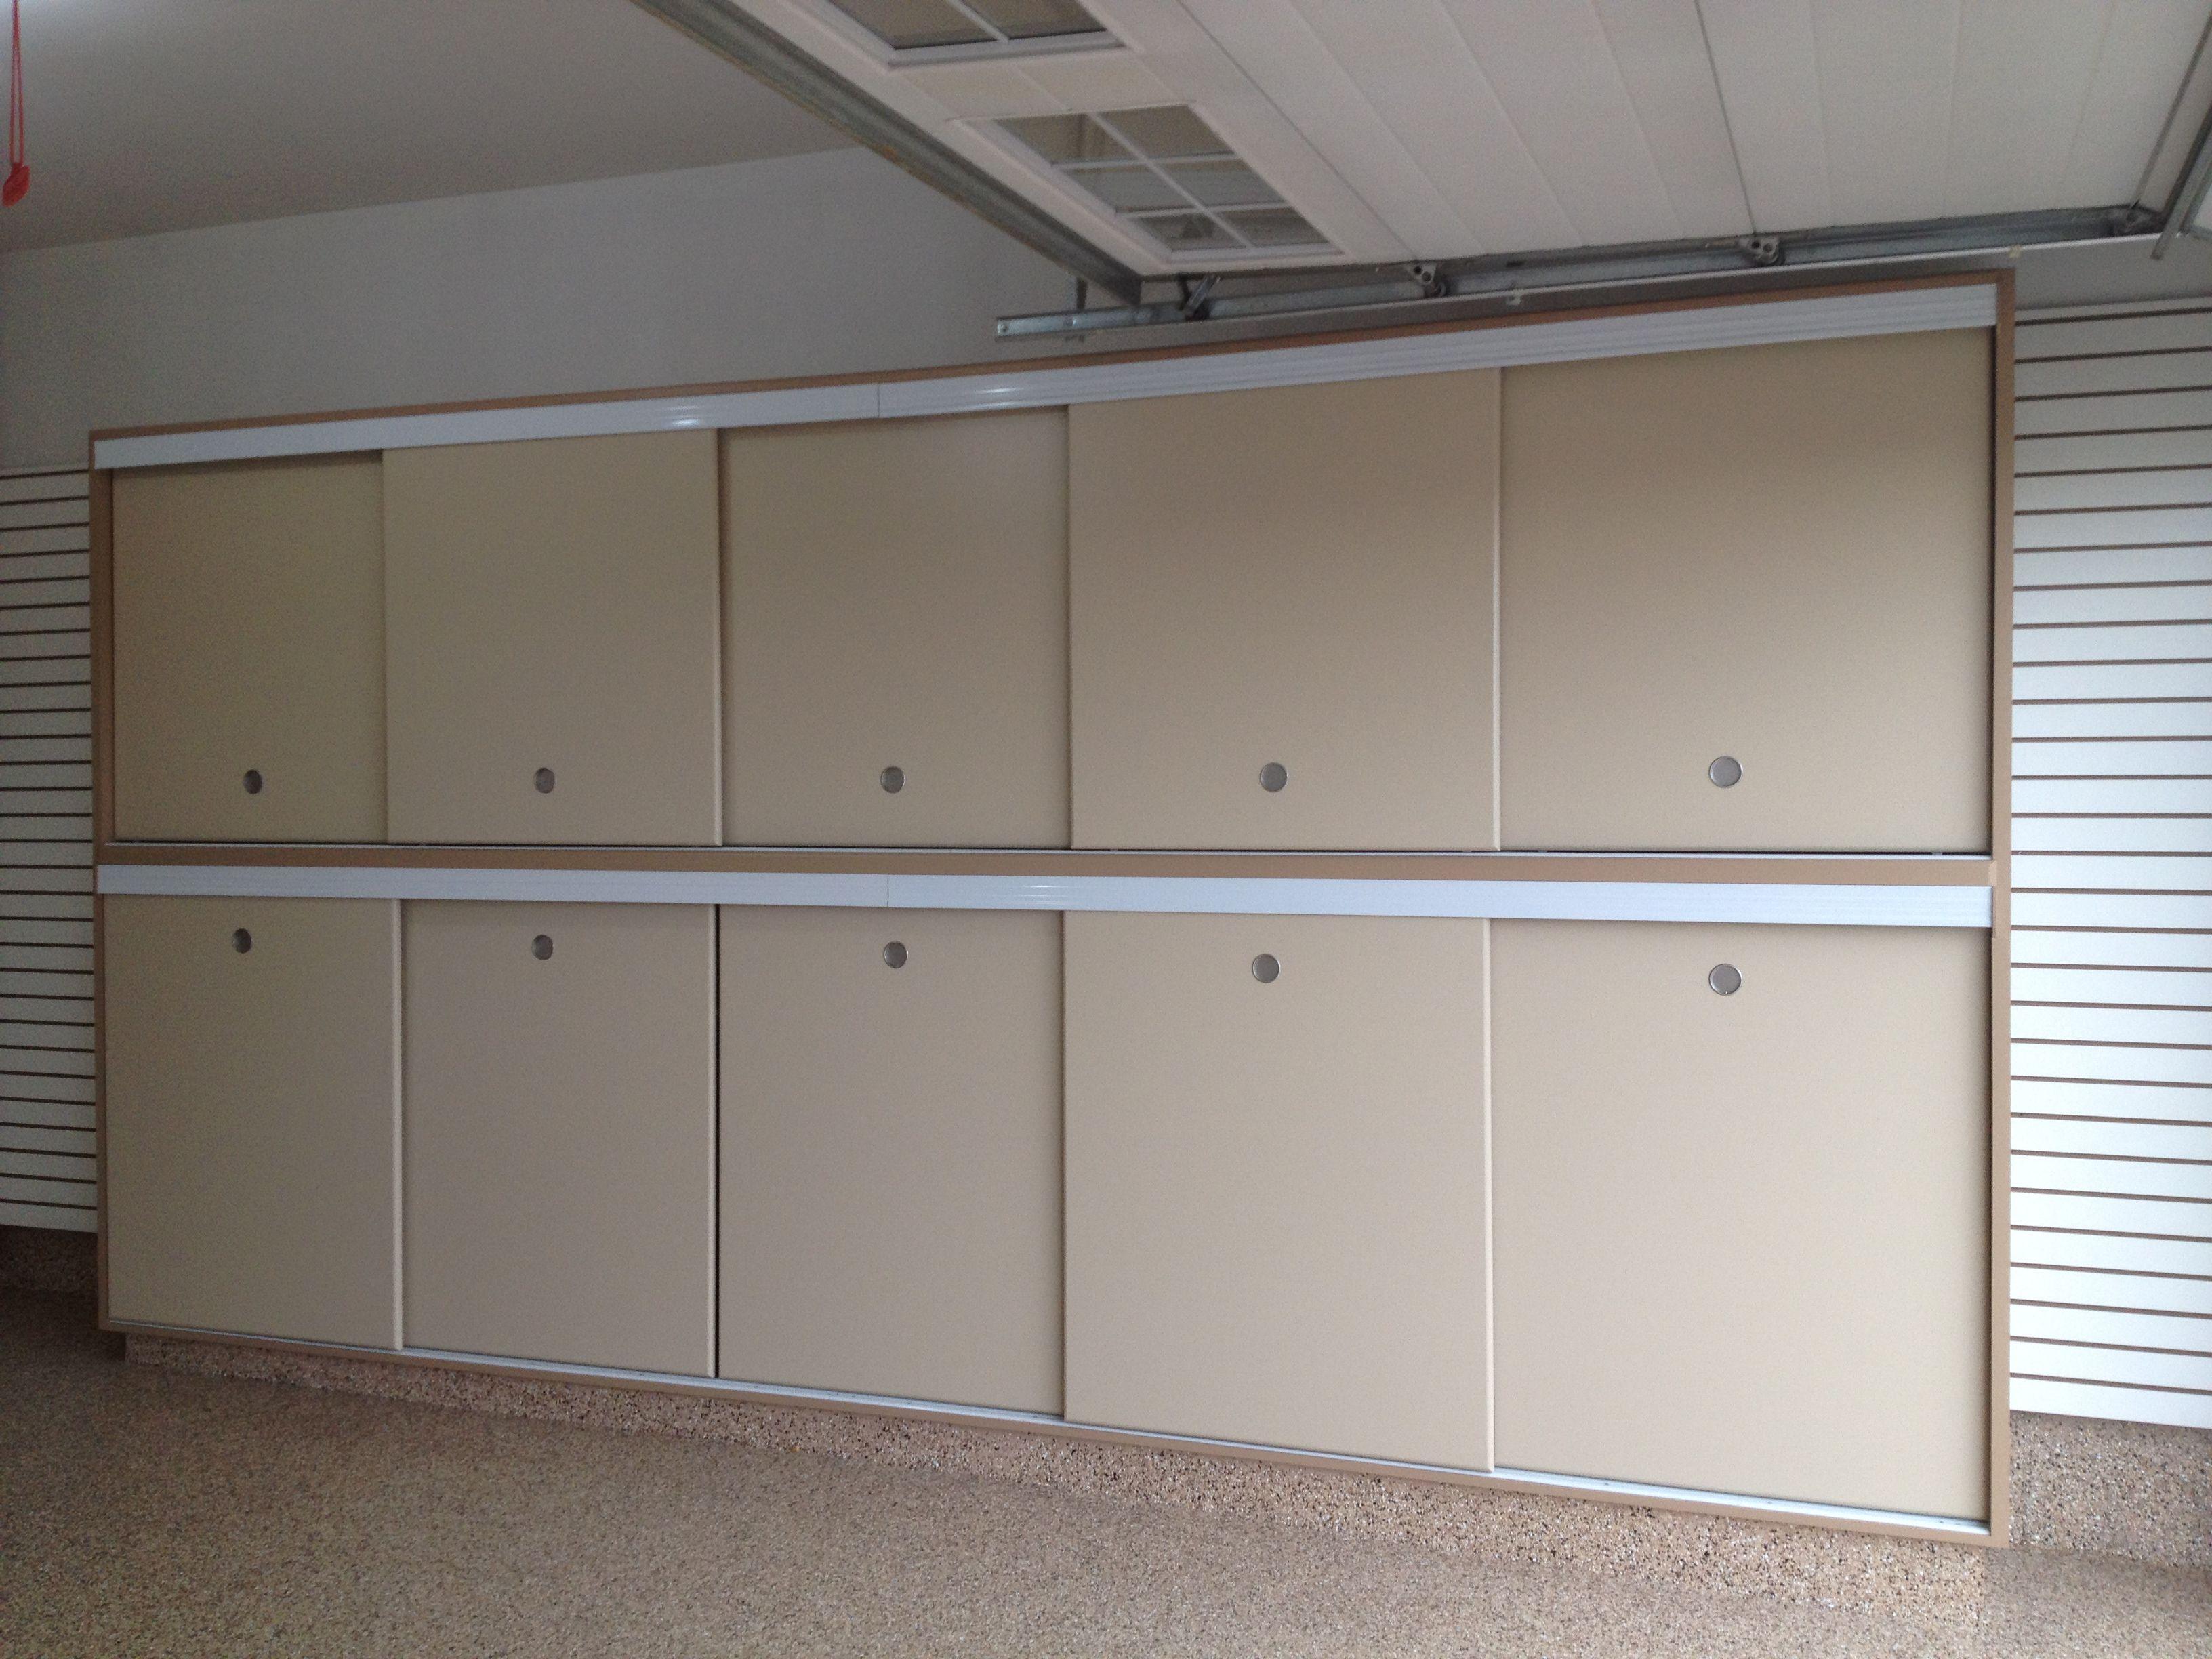 Slotwall Epoxy Floor Custom Cabinets Sliding Doors Built In